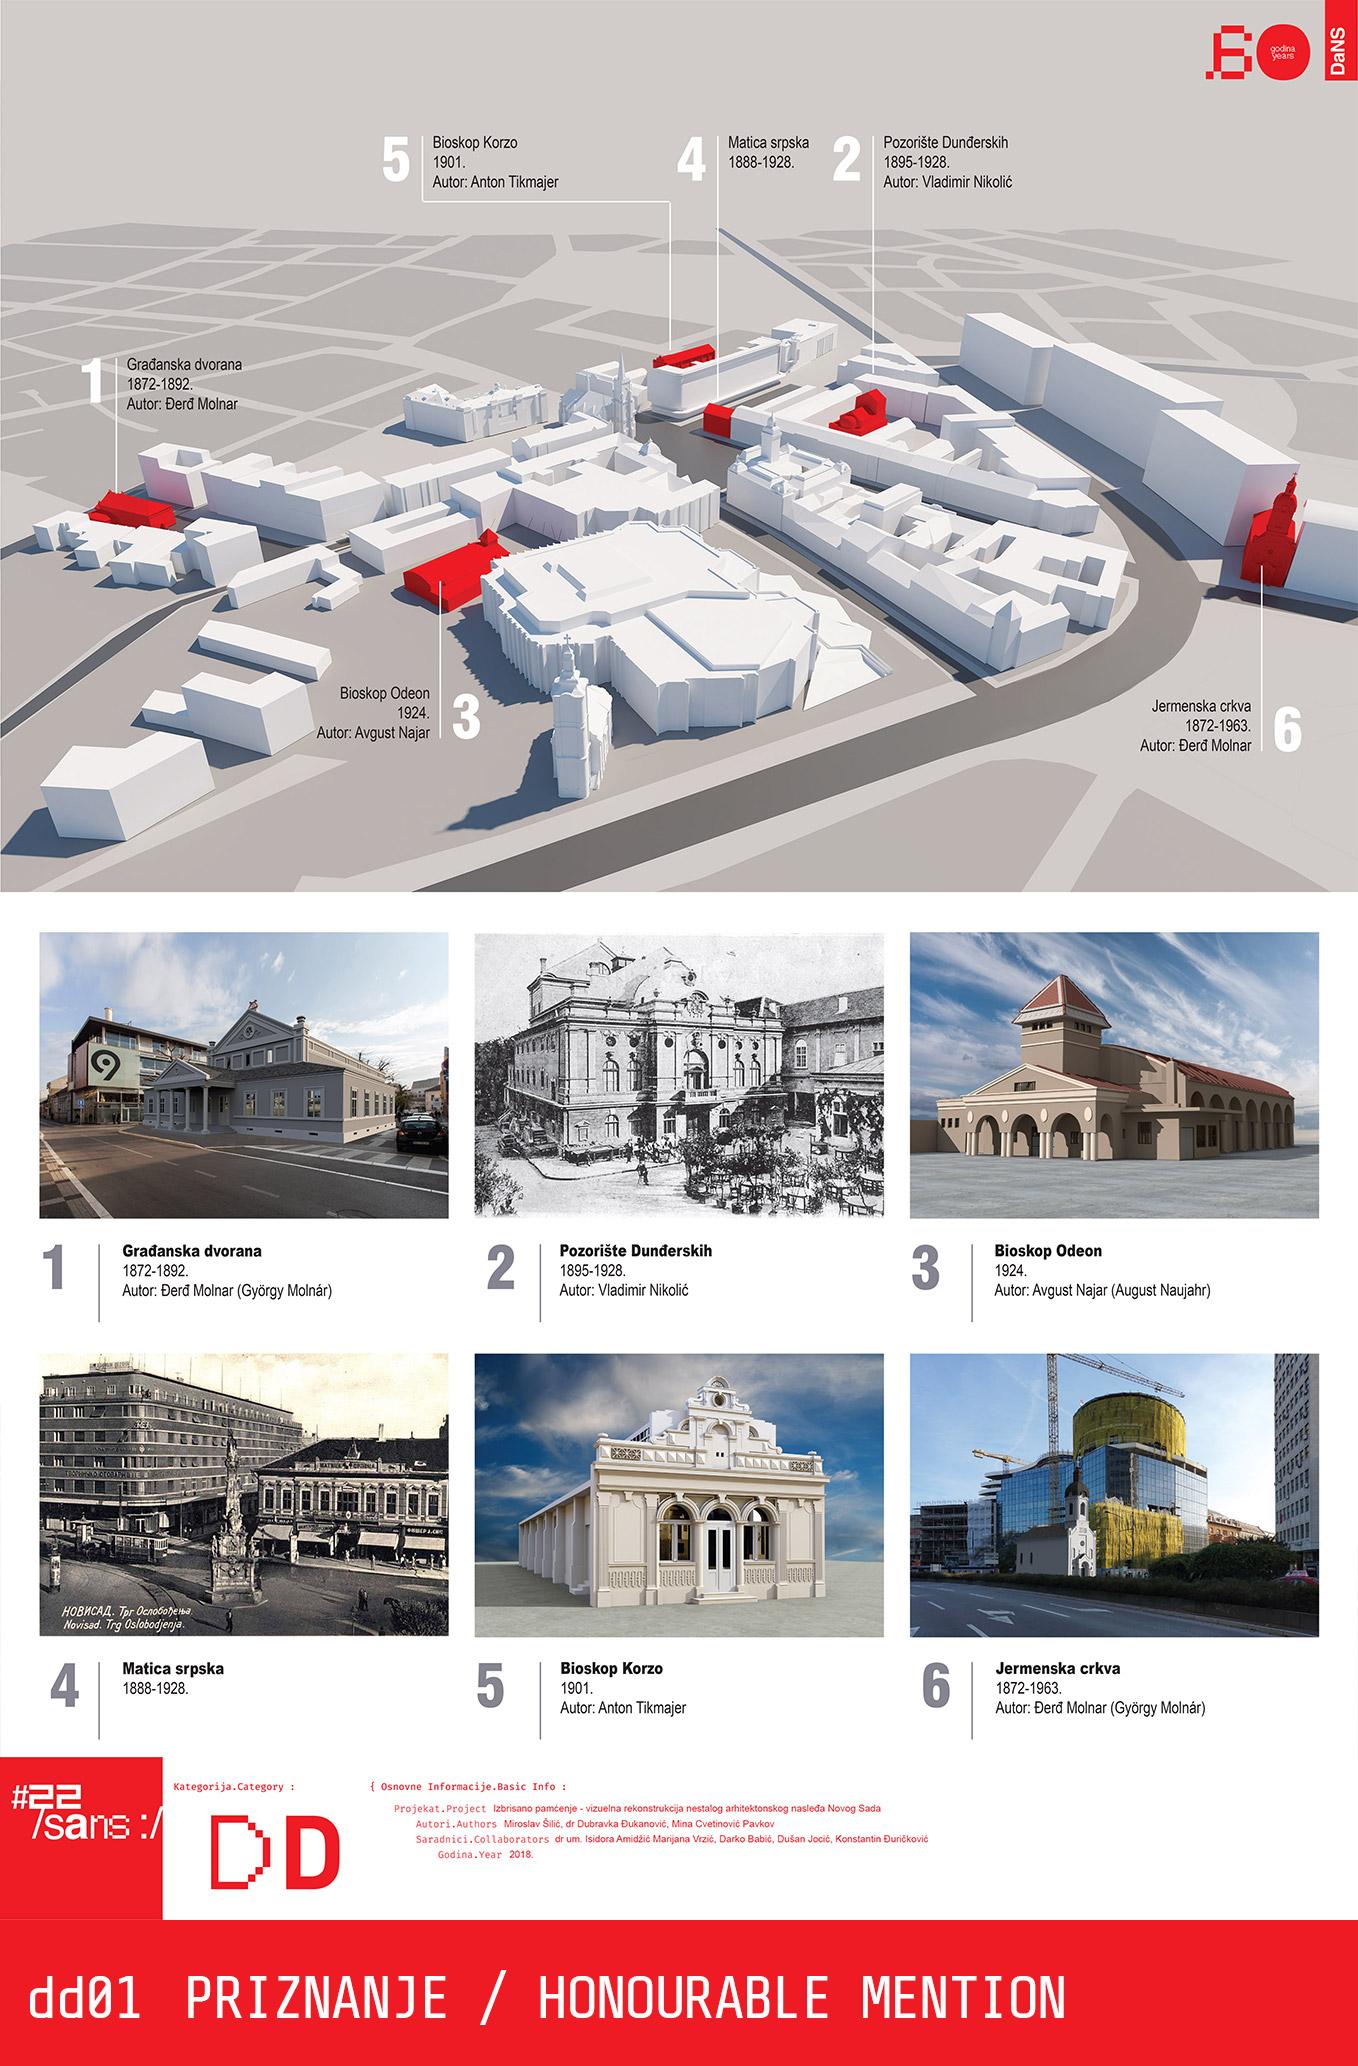 "<p class=""naslov-br"">dd01</p>Izbrisano pamćenje: vizuelna rekonstrukcija nestalog arhitektonskog nasleđa Novog Sada // Erased memory: A Visual Reconstruction of the Forgotten Architectural Heritage of Novi Sad"